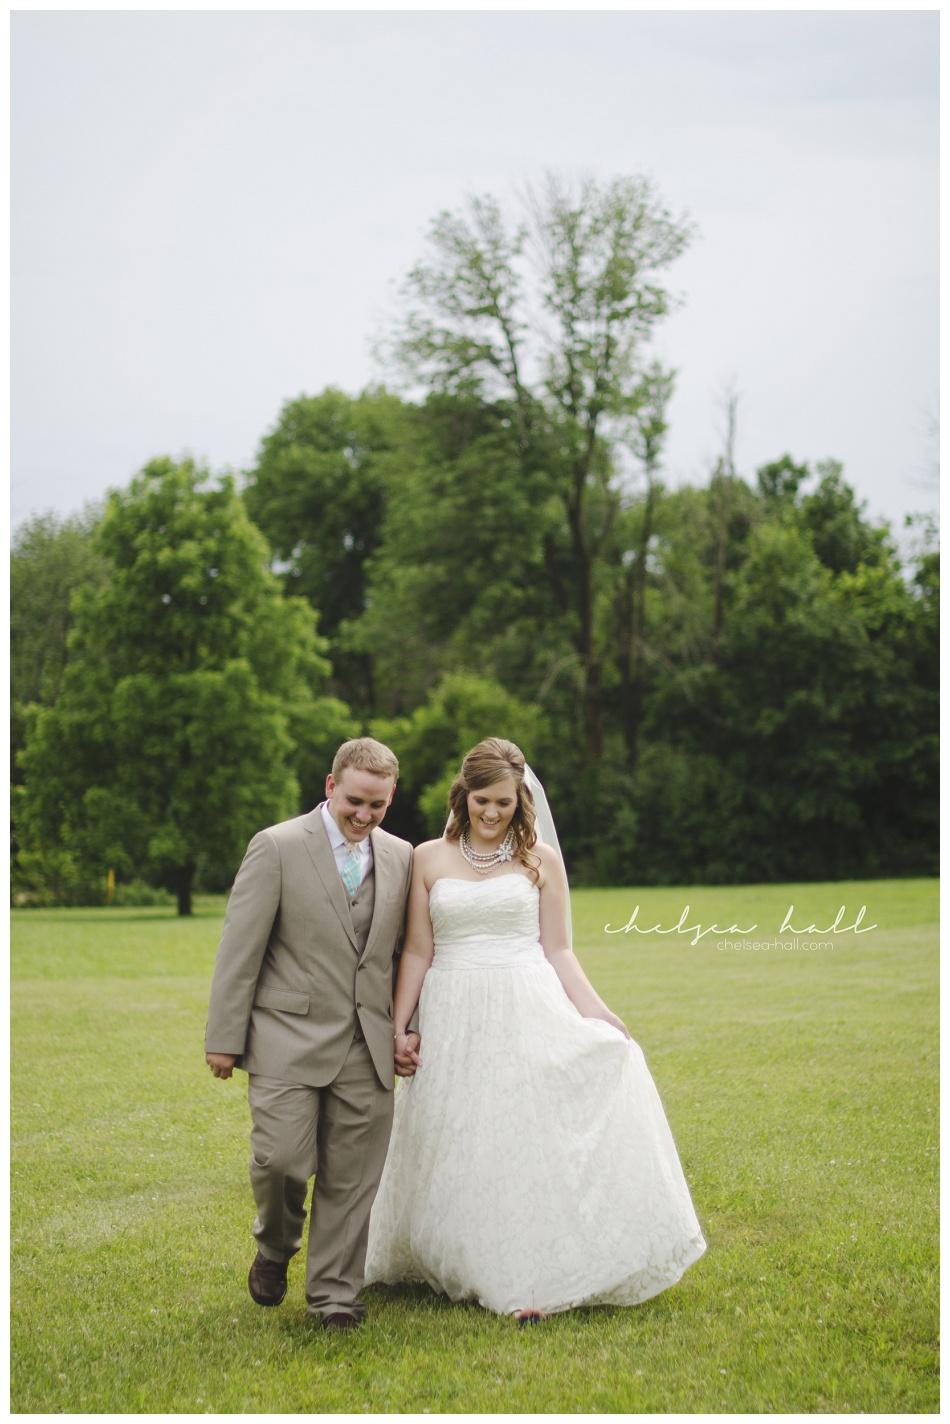 Chelsea Hall Photography, Dayton Wedding Photography, Kettering Wedding Photographer_0001